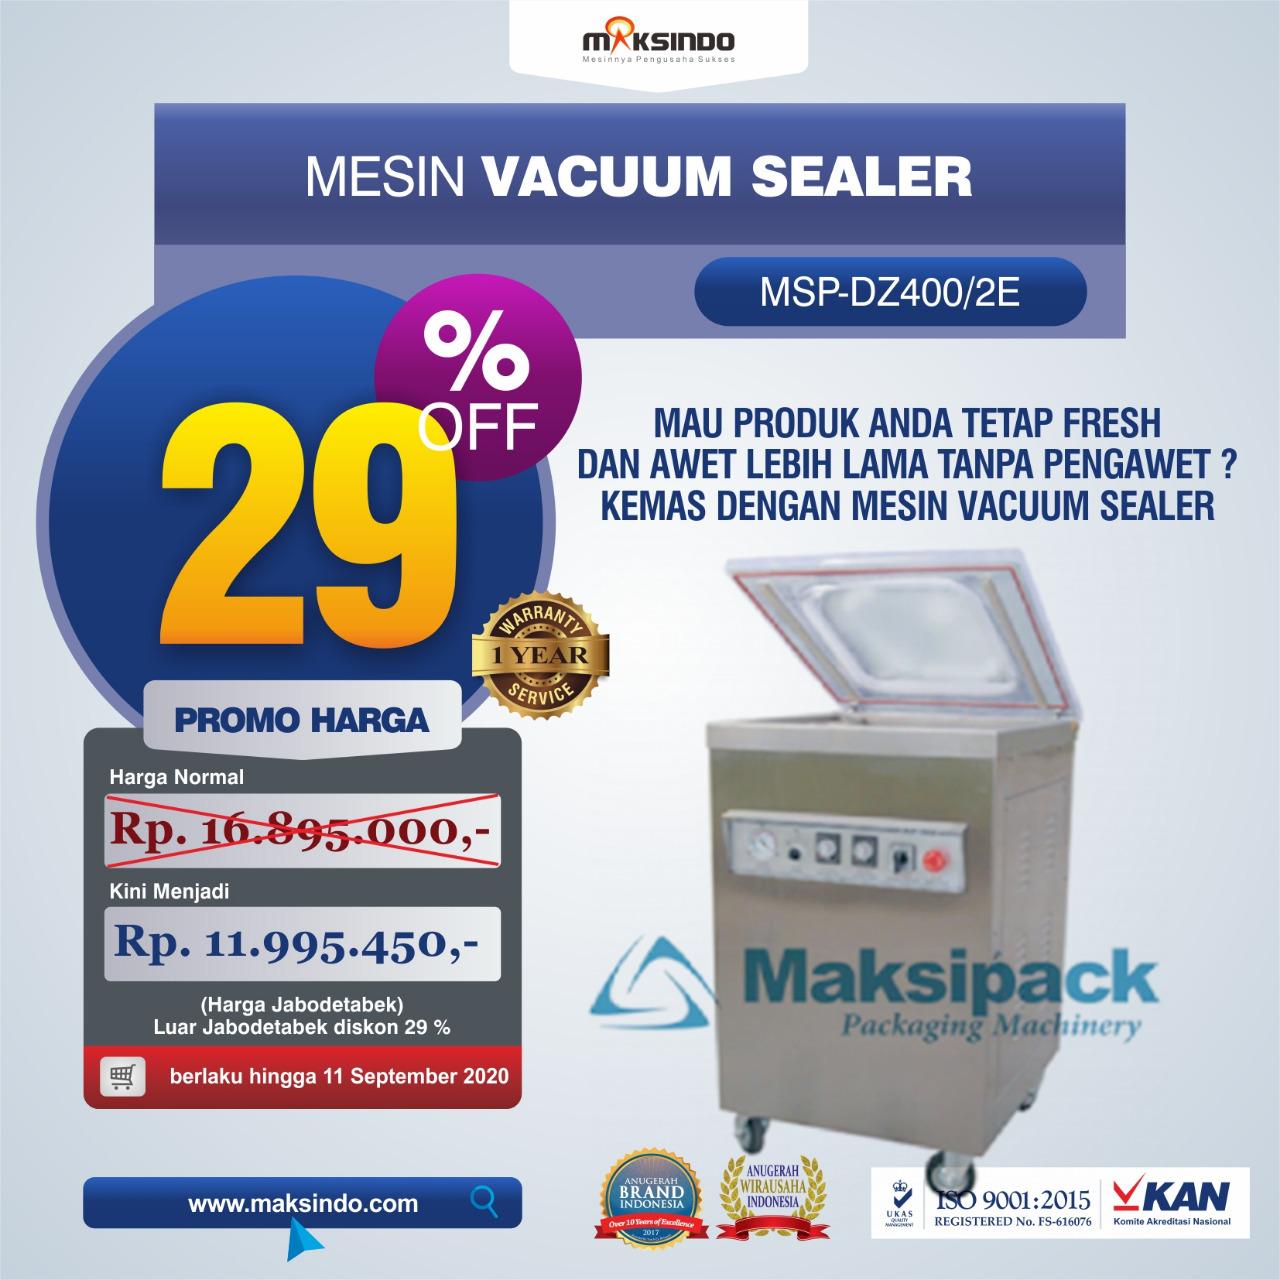 Jual Mesin Vacuum Sealer (MSP-DZ400/2E) di Bekasi